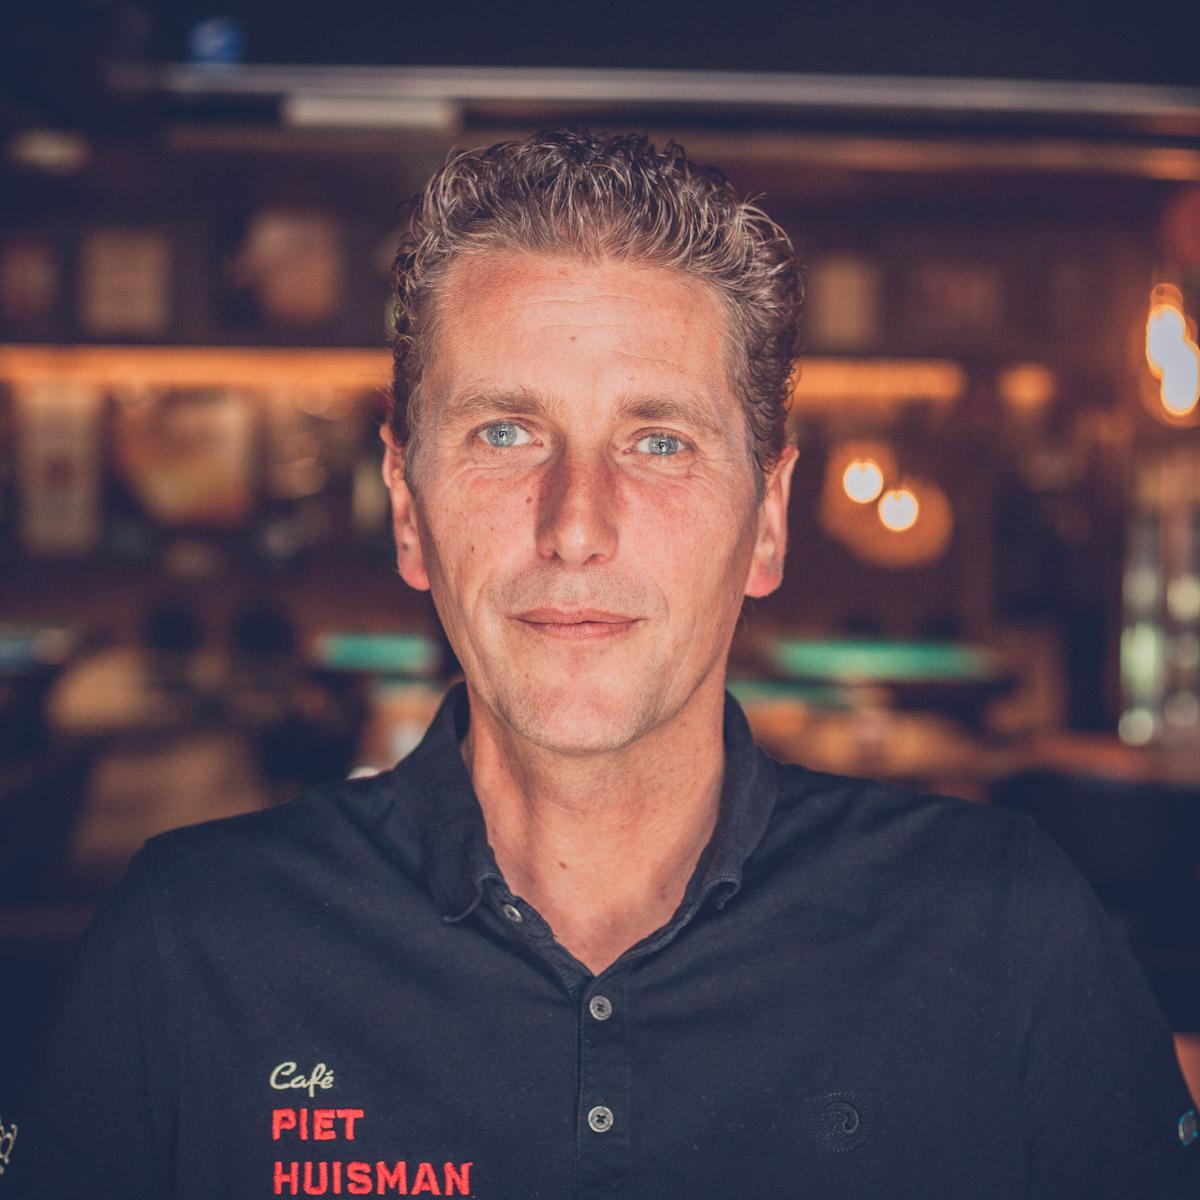 Café Piet Huisman Team Jeroen